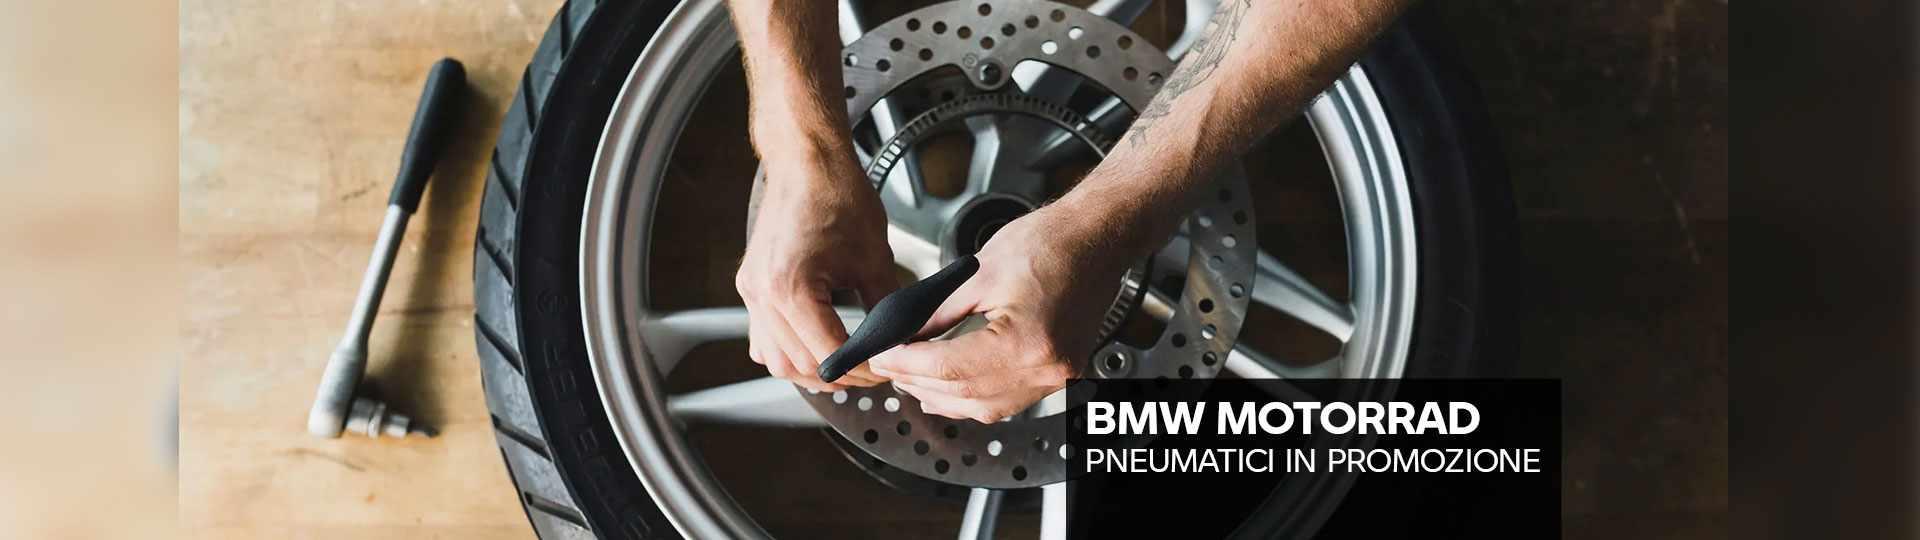 BMW-MOTORRAD_Promo-pneumatici-min.jpg